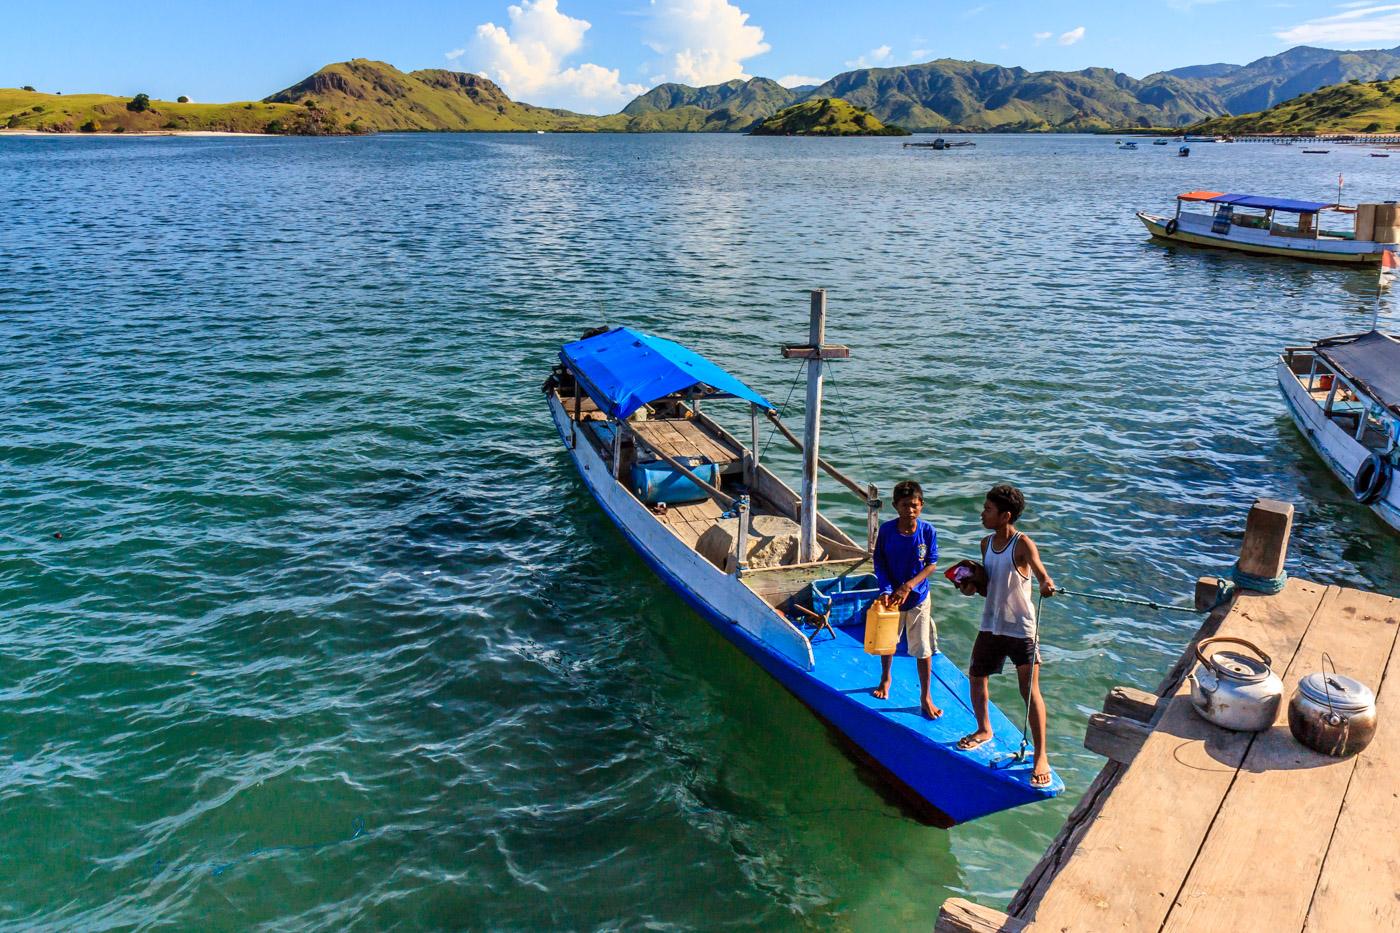 Boys unloading a boat.